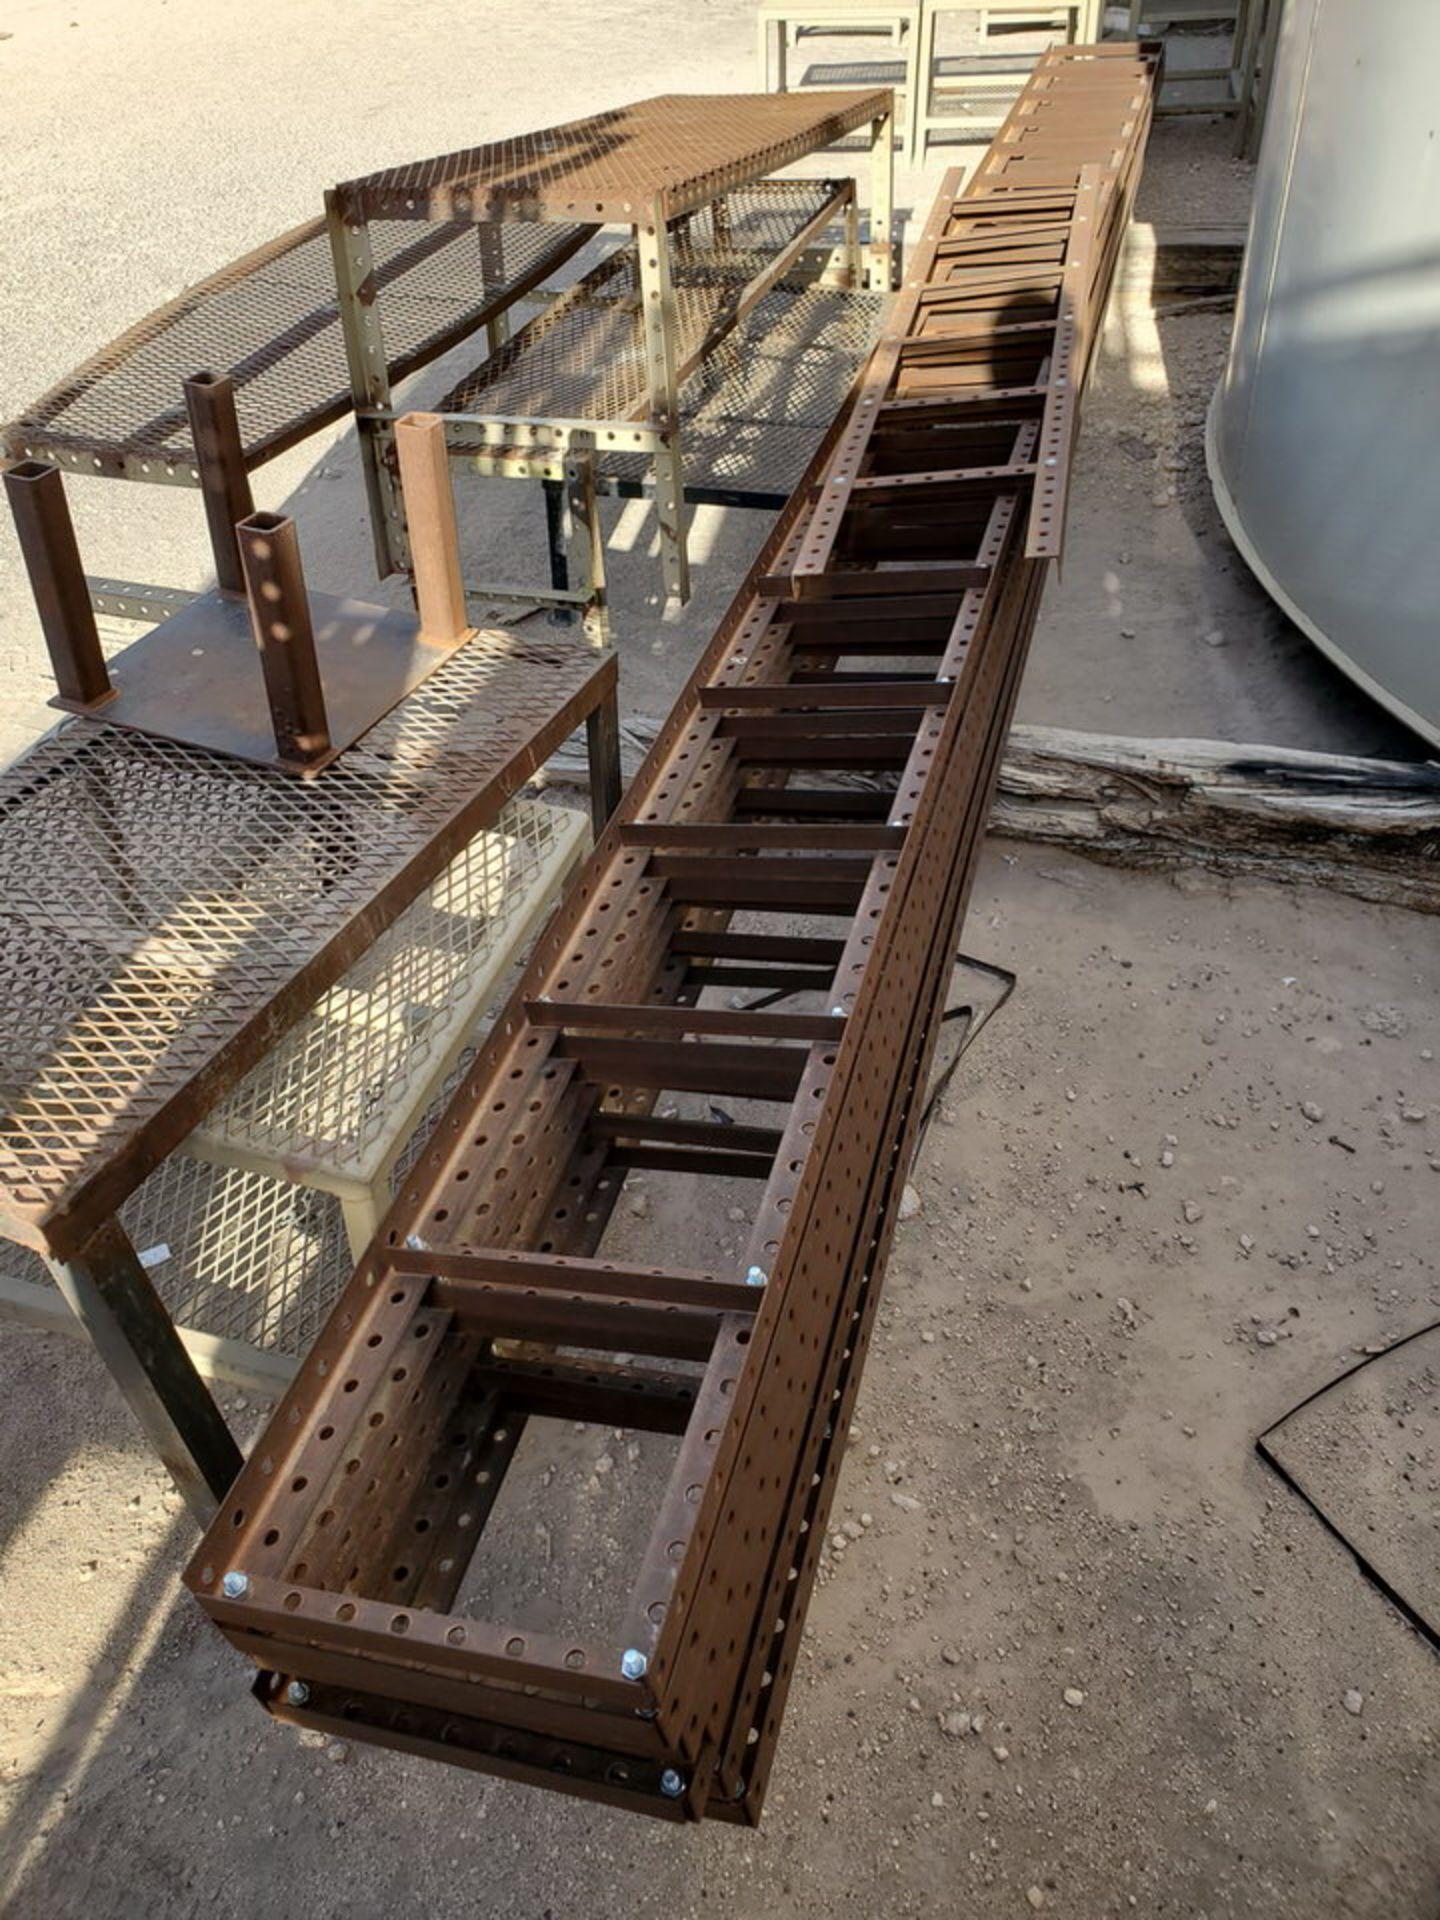 "Assorted Stl Matl. Racks & Ladders Size Range: 30"" x 26"" x 25""H - 29"" x 48"" x 50""H - Image 3 of 18"